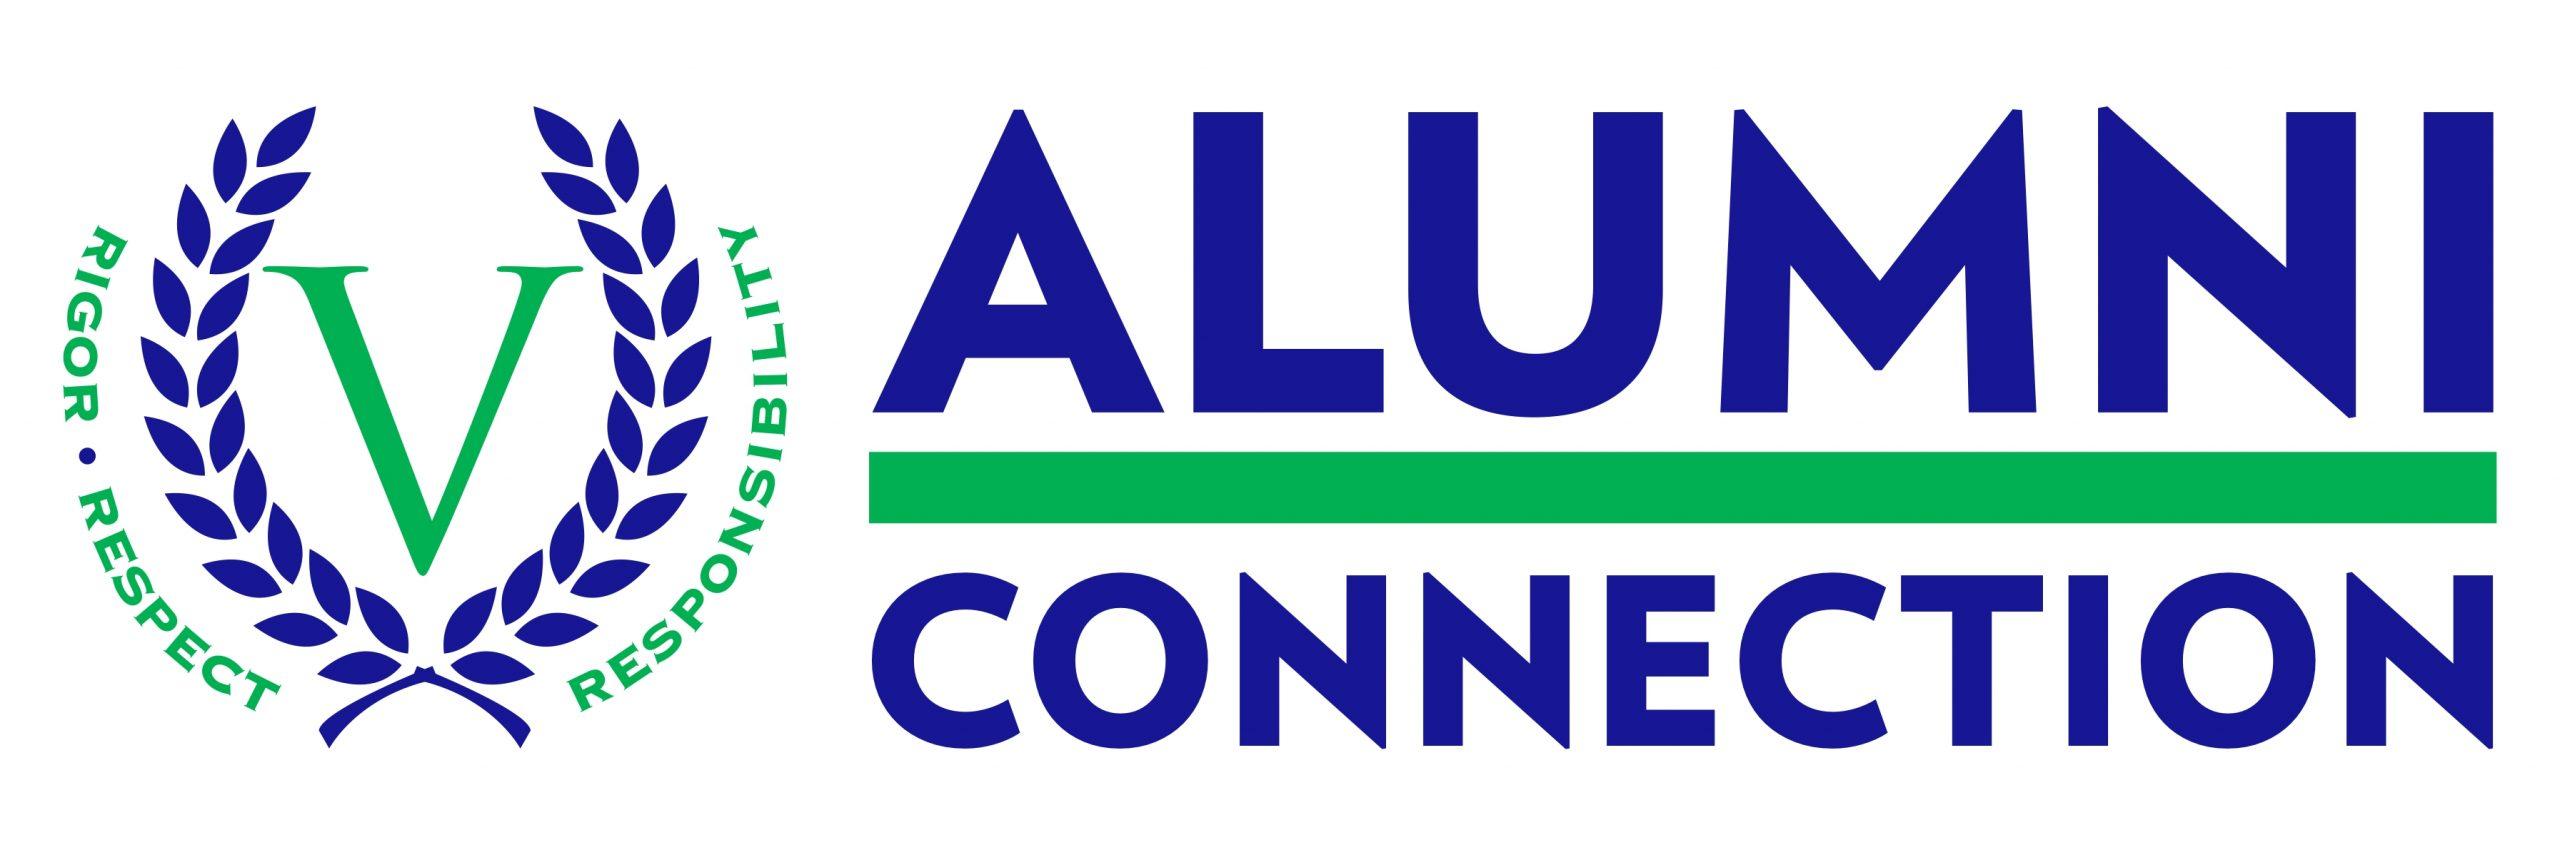 The Vanguard Alumni Connection